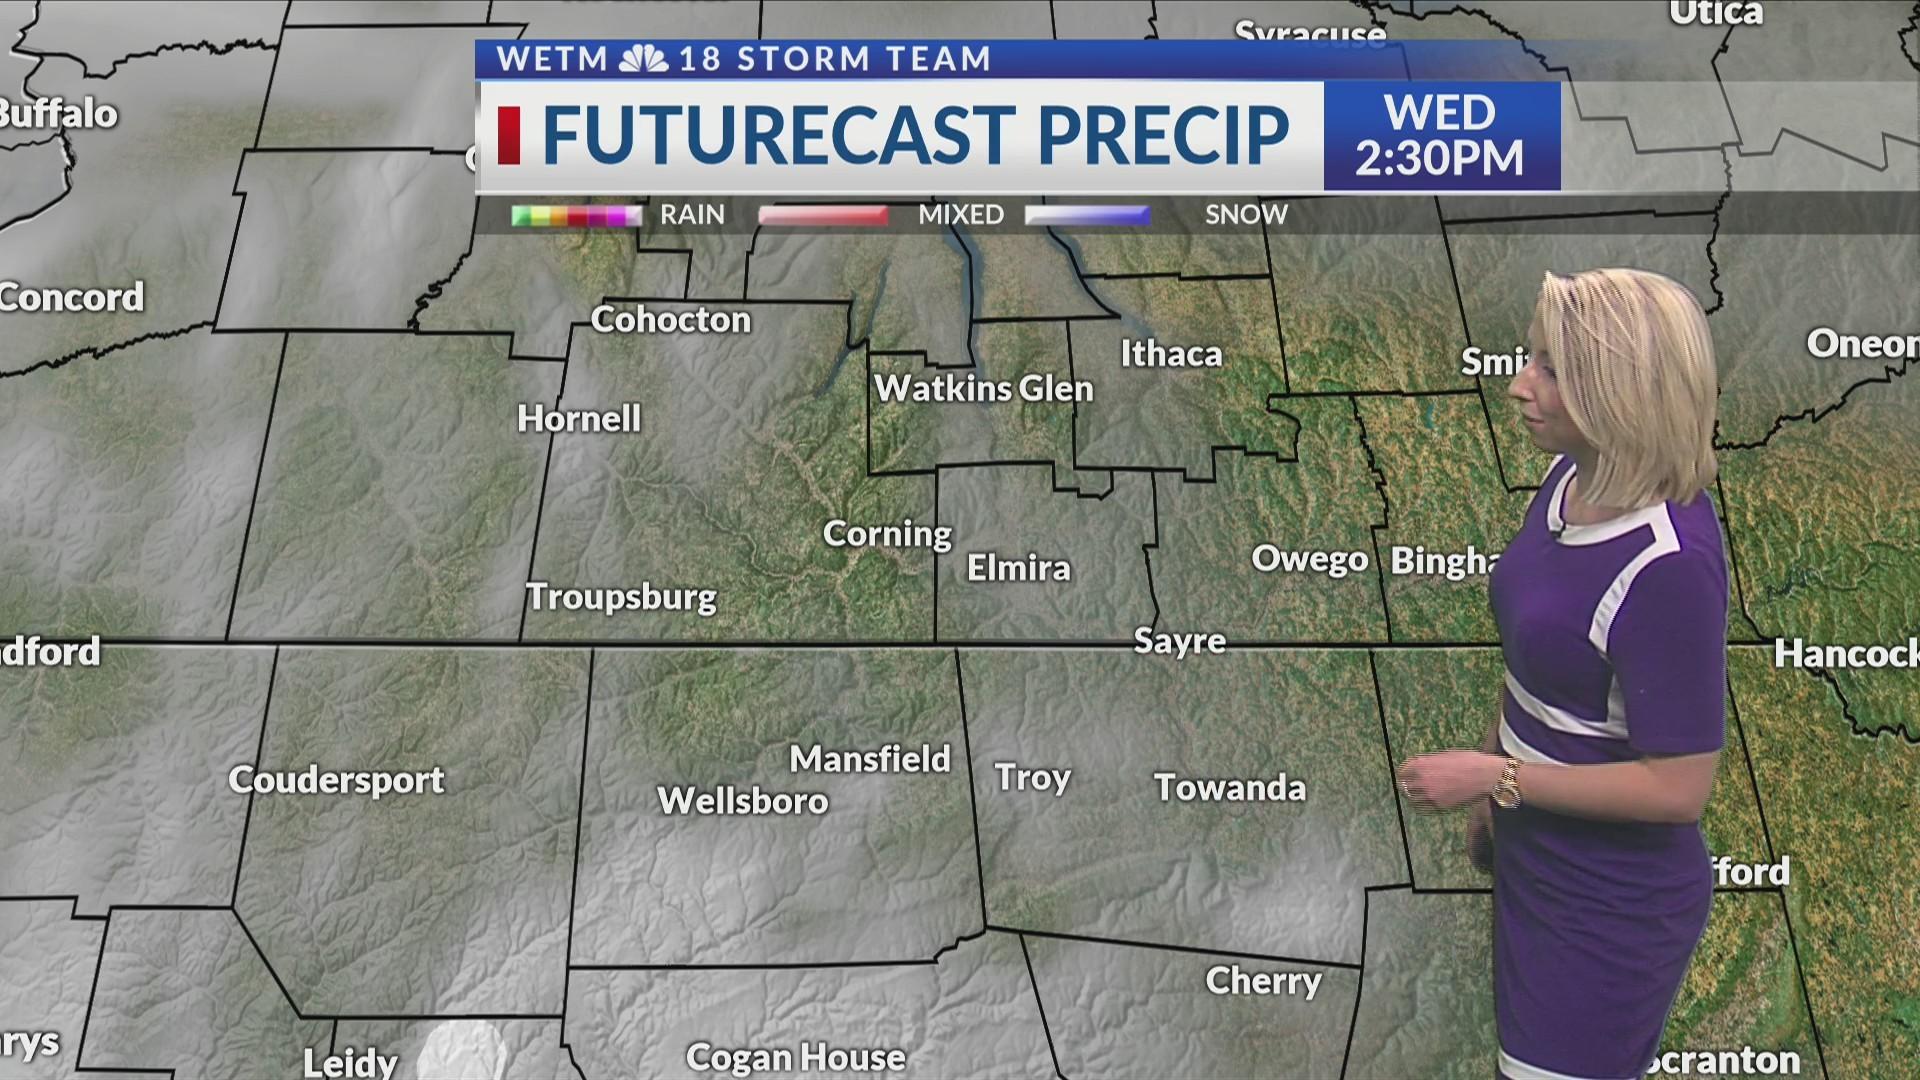 Tuesday Evening 7-Day Forecast (1/1/19)